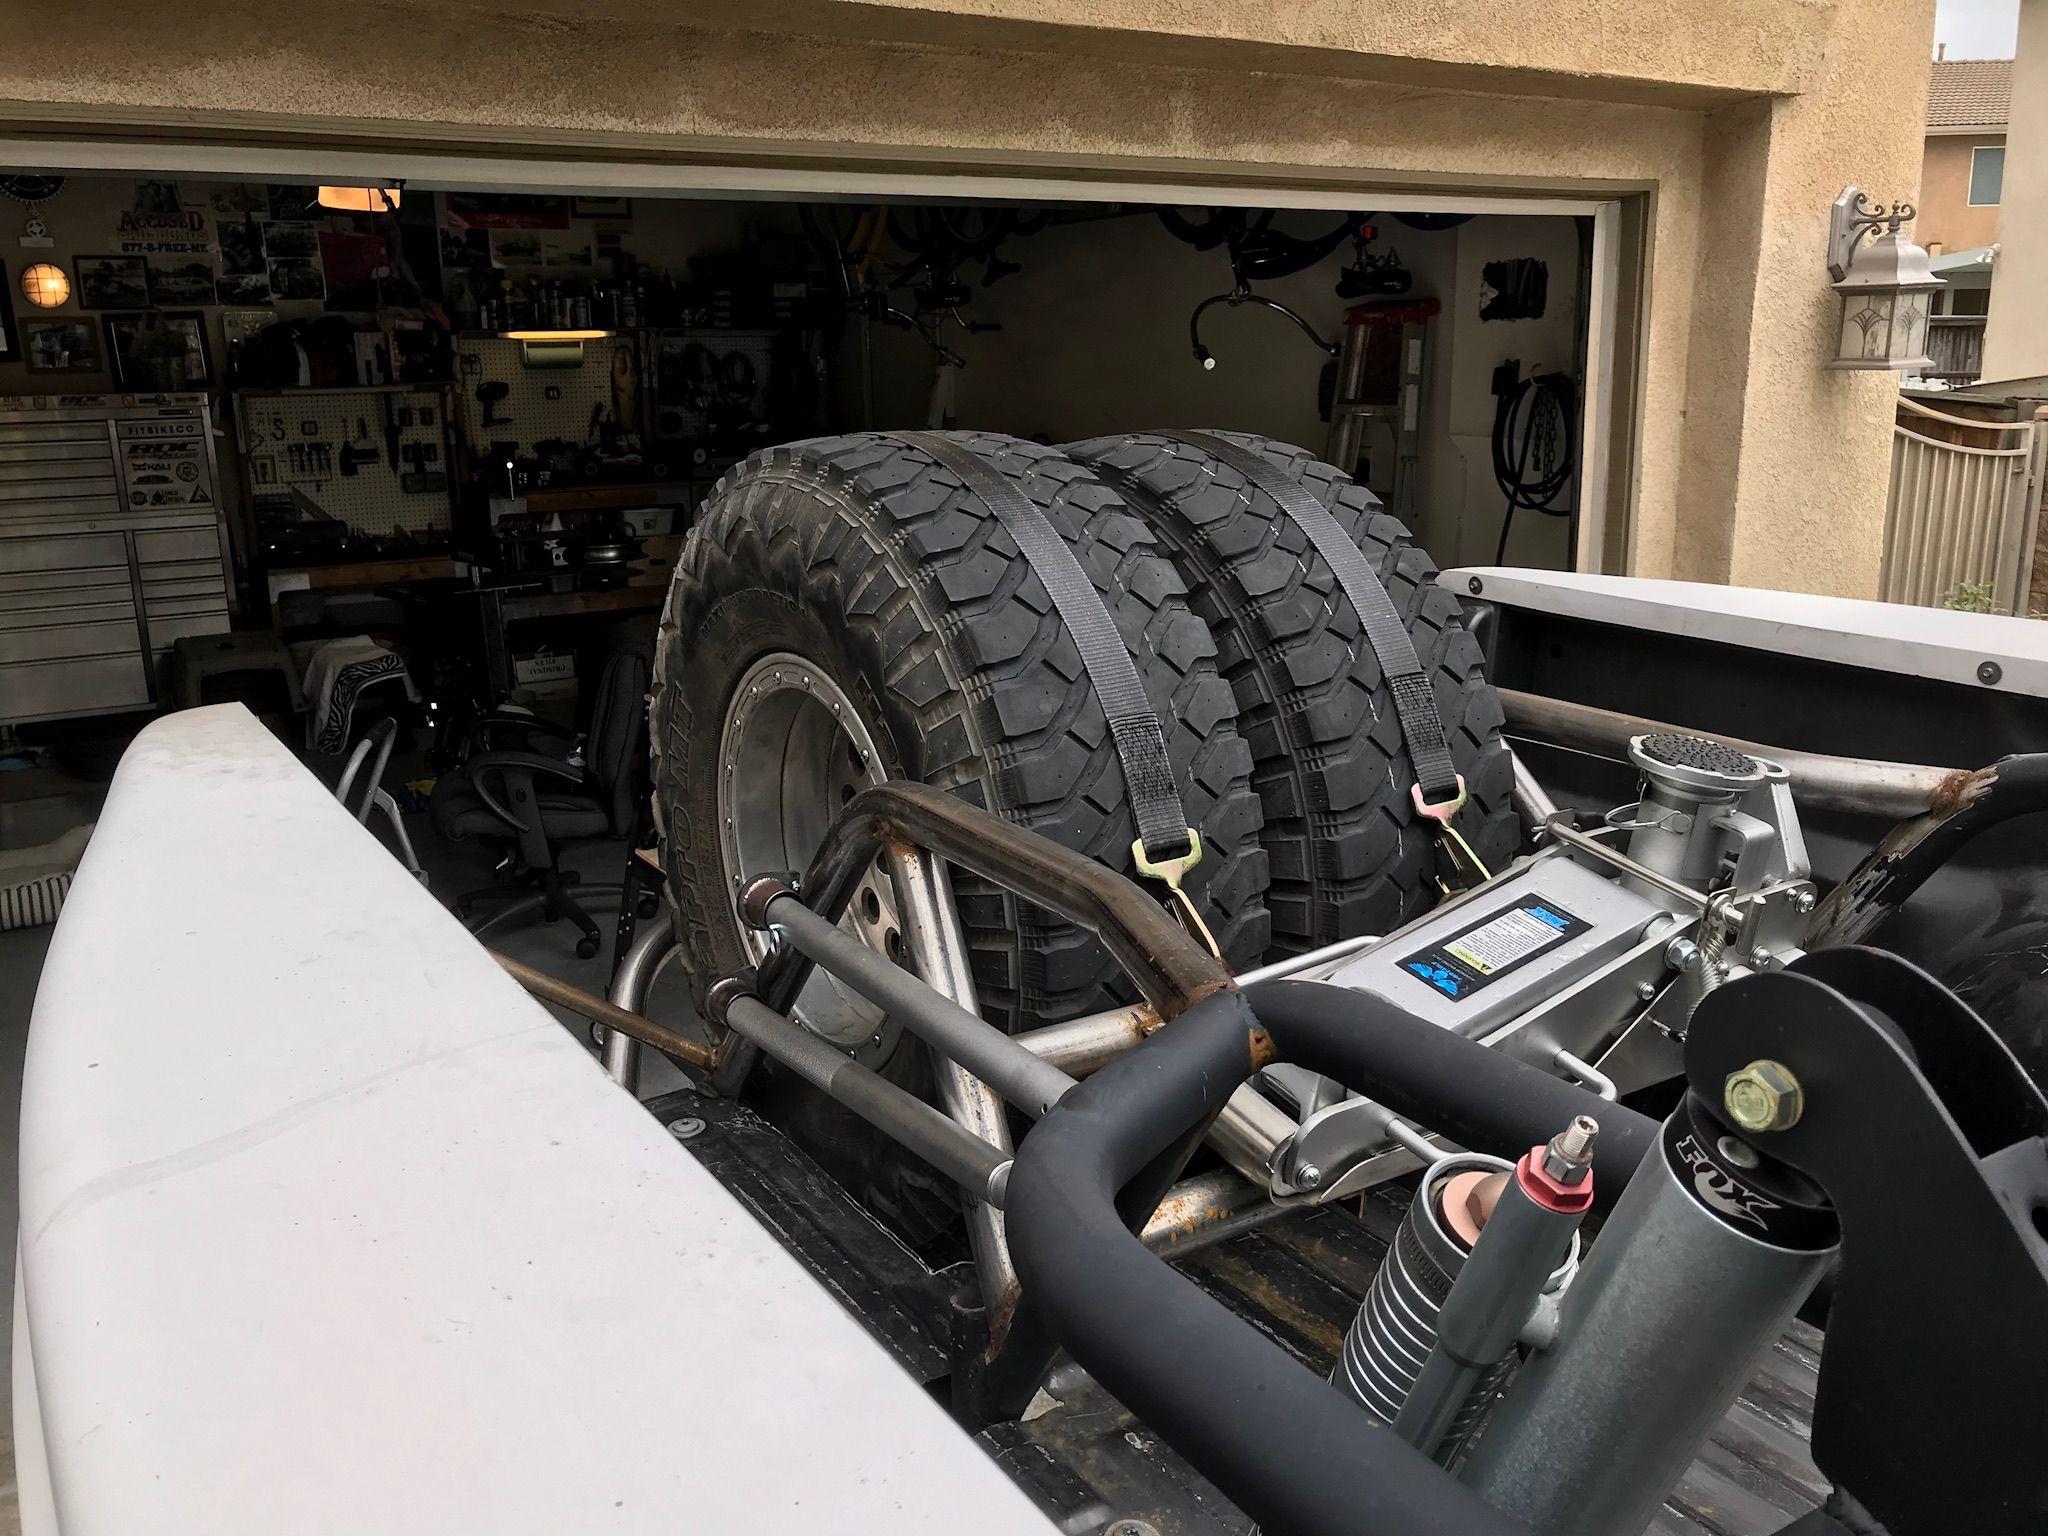 F250 Prerunner Rear Bed Cage Tire Carrier And Jack Mount Ford Ranger F250 Ford Ranger Prerunner